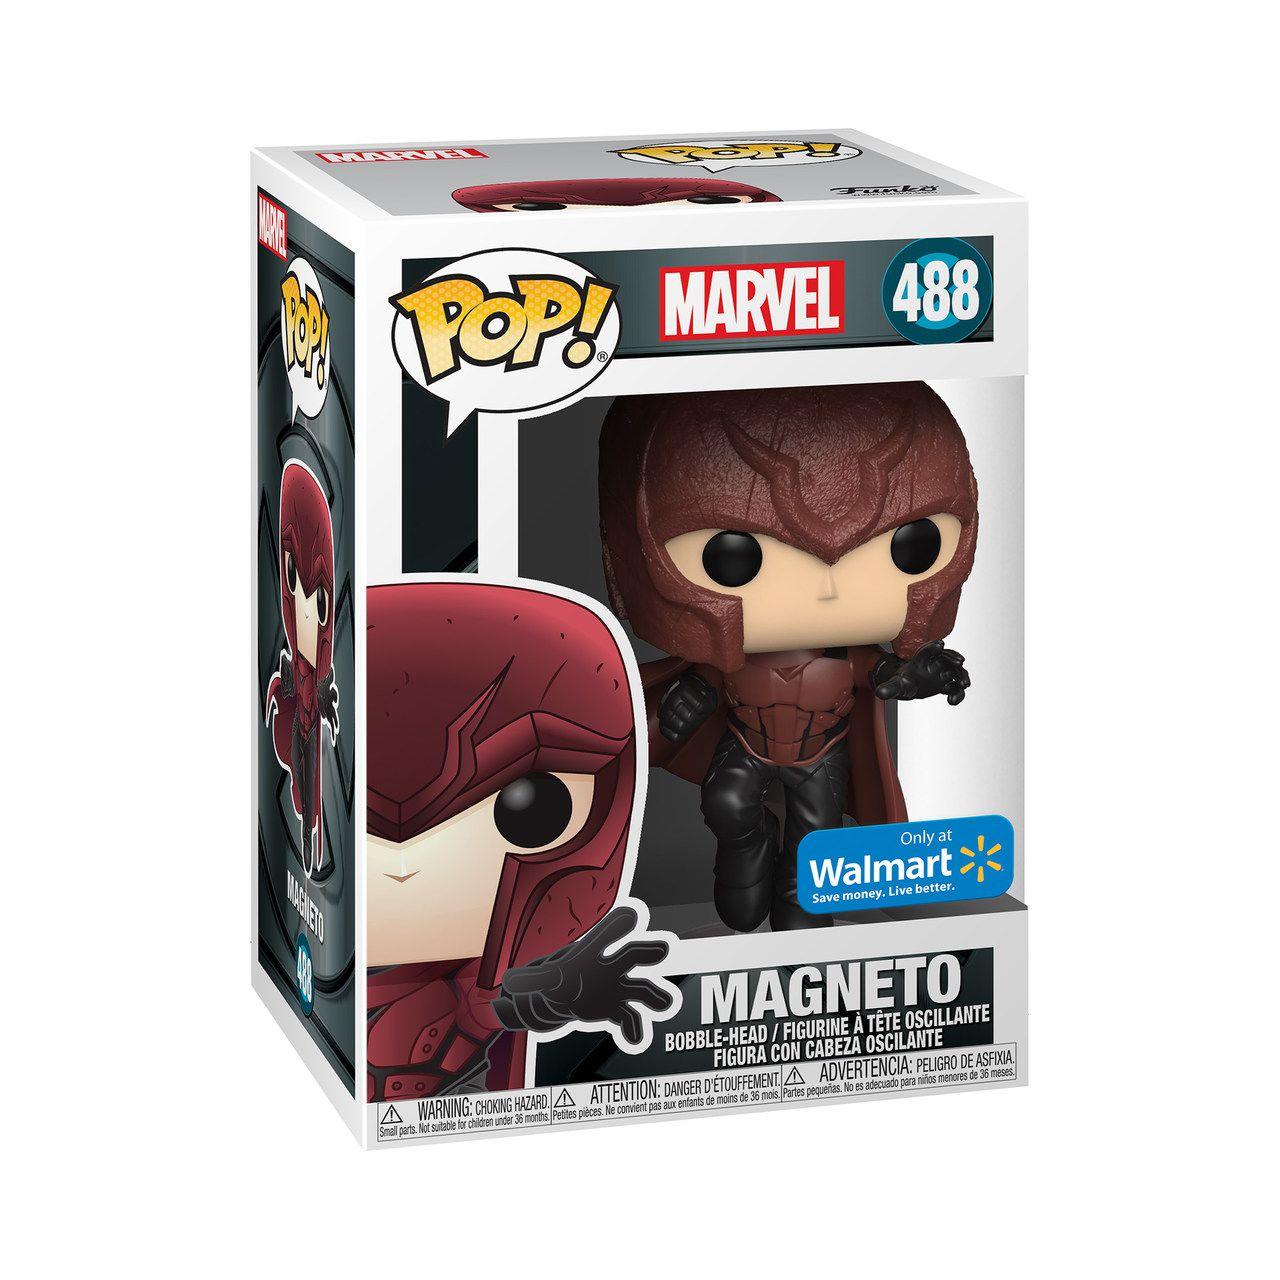 PRÉ VENDA: Funko Pop! Magneto Jovem Marvel: X-Men o Filme - Aniversário 20 anos - (X-Men 20th Anniversary) #488 - Exclusivo Wallmart - Funko